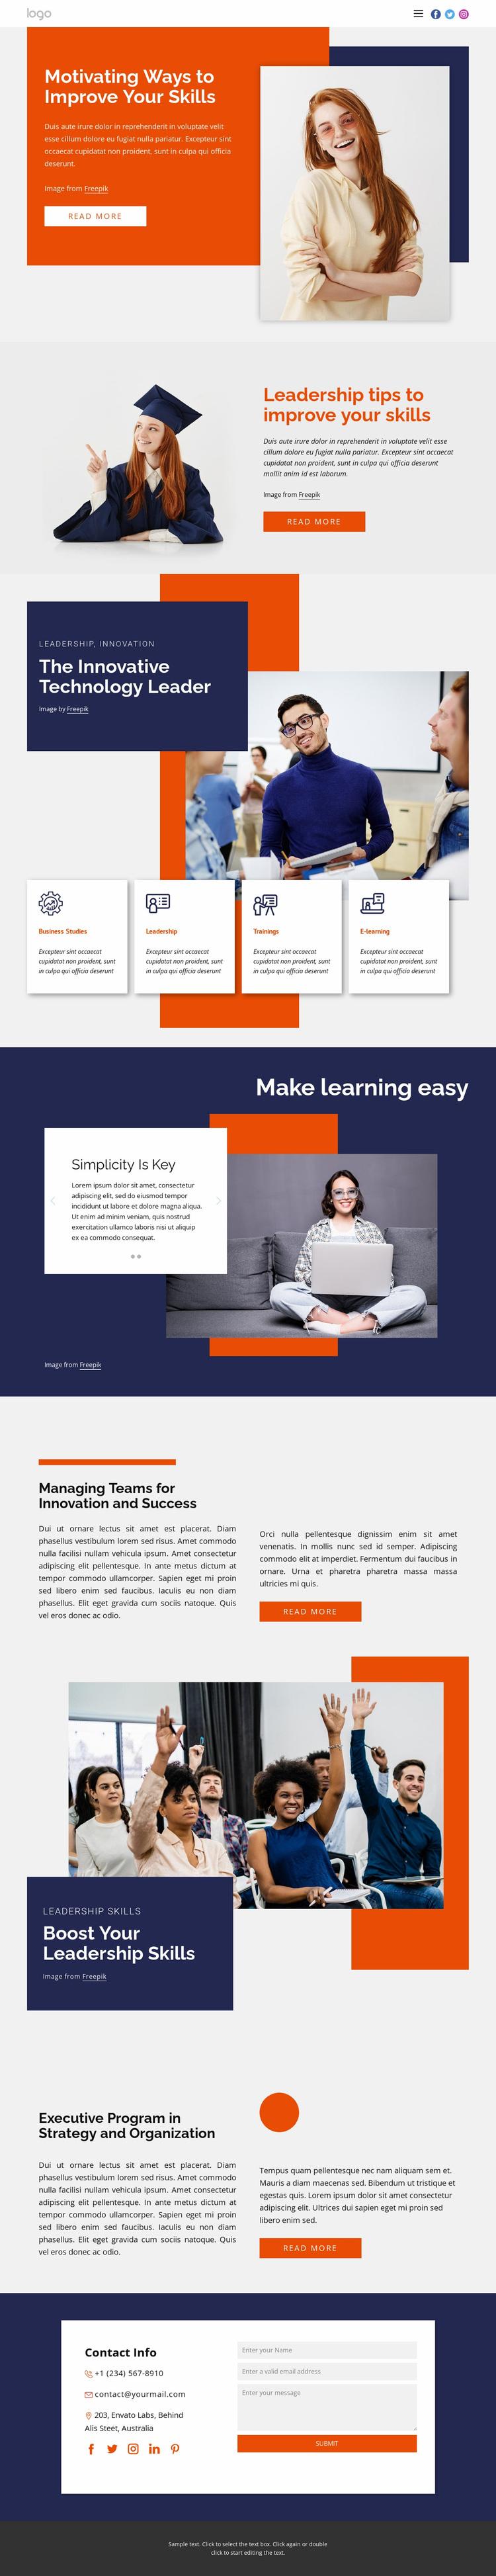 Drive your career forward Website Design